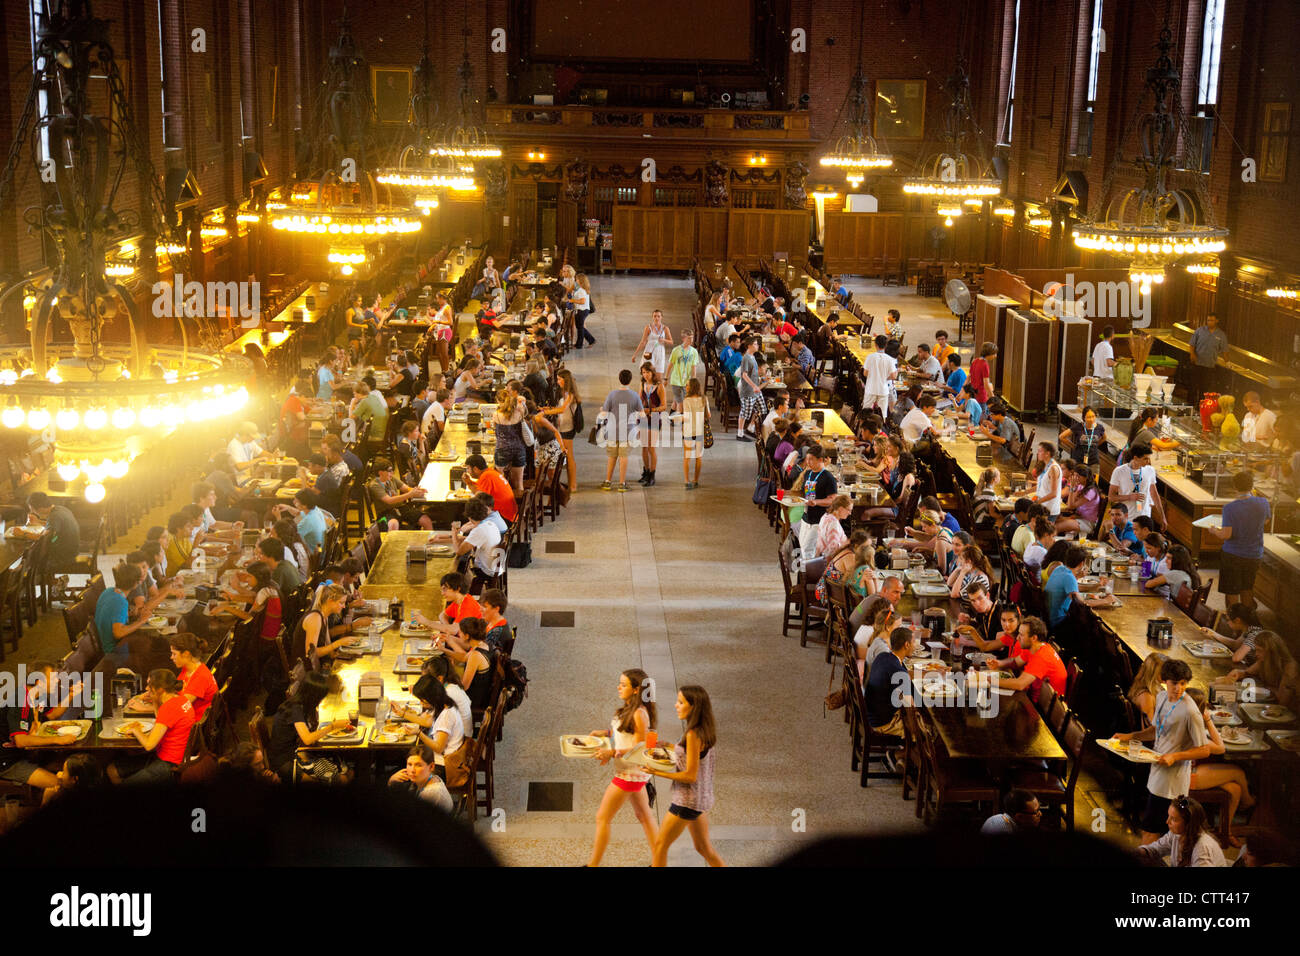 Speisesaal An Der Yale University In New Haven Ct Stockfoto Bild